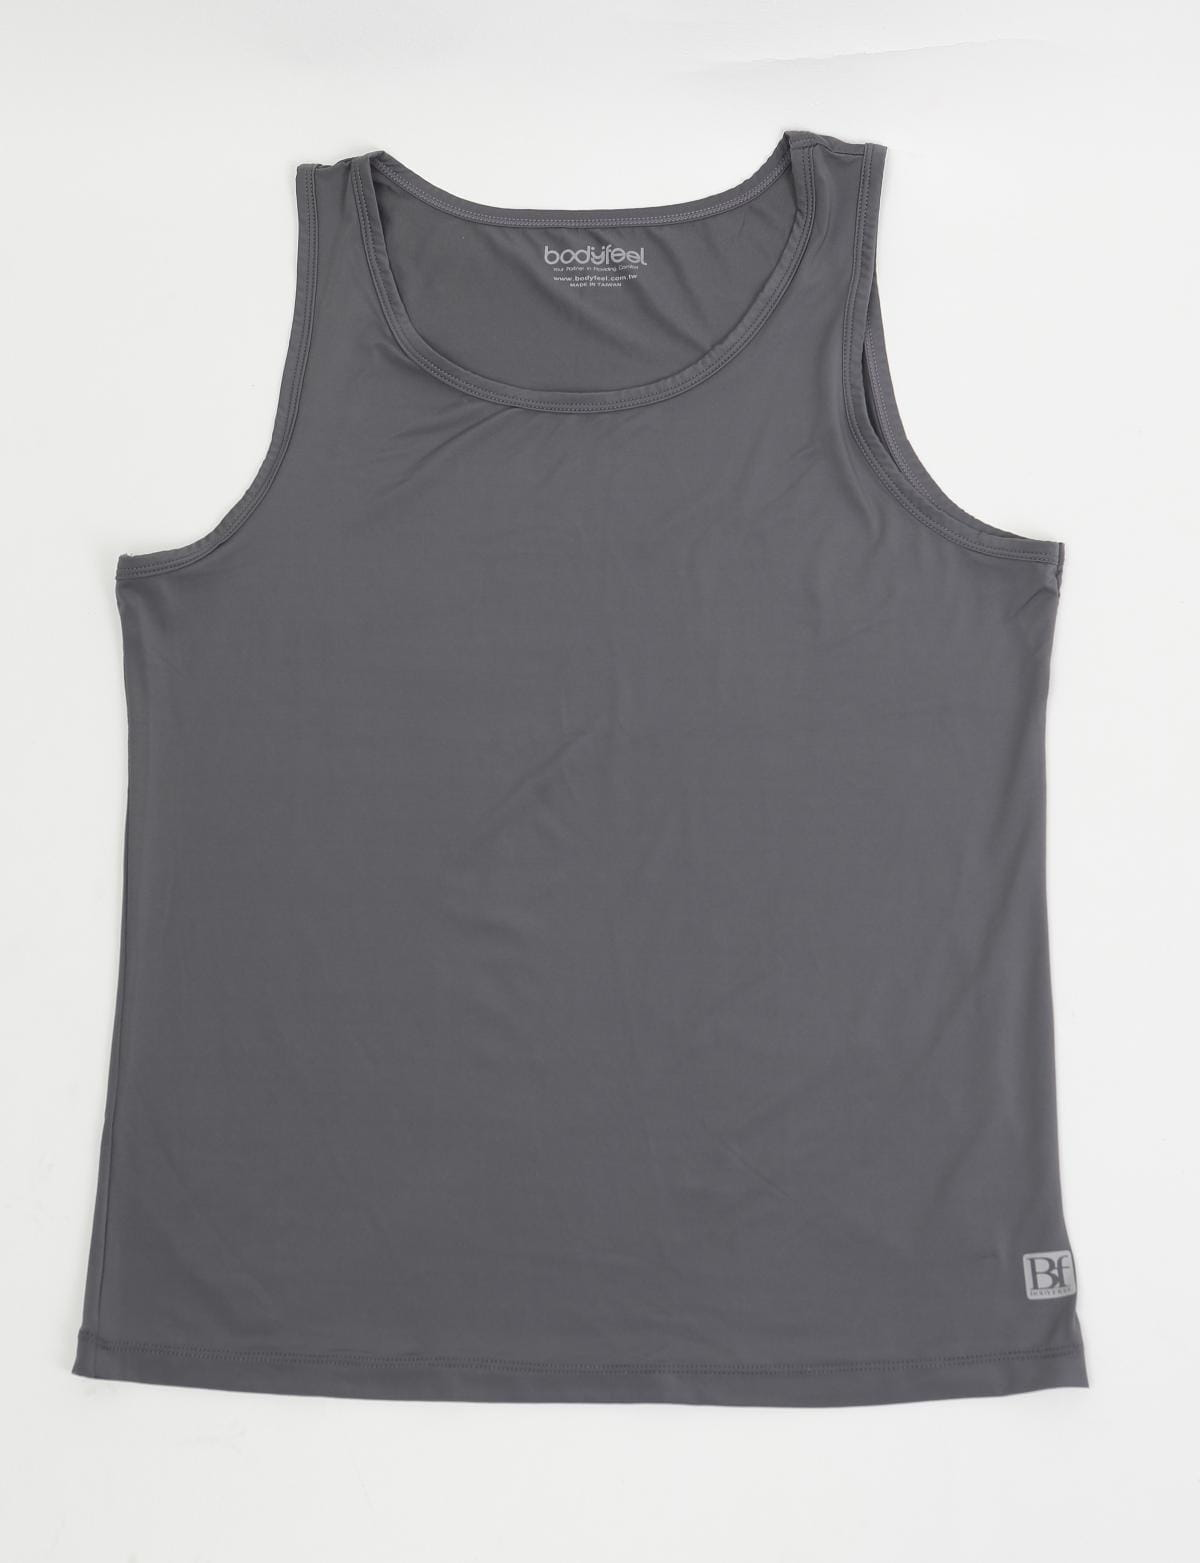 【BODYFEEL】体感服飾-夏季男款涼感抗UV坦克背心 8